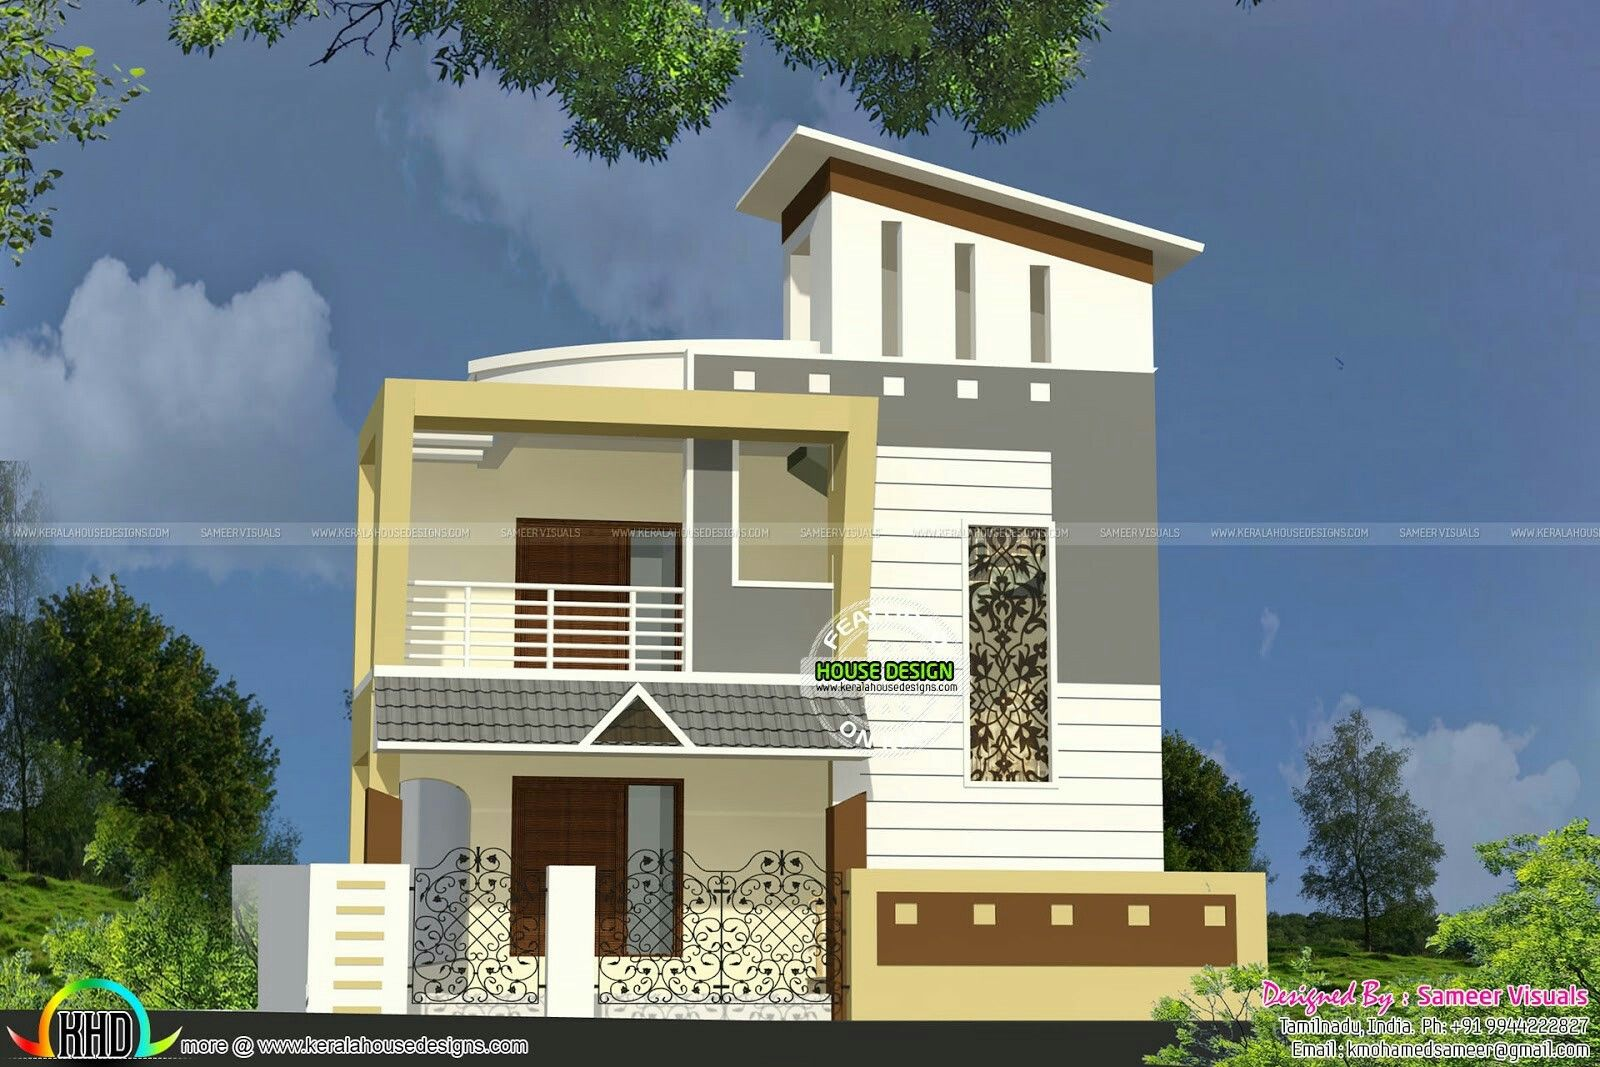 Pin By Lakshman Lakshman On Elevations Small House Design Narrow House Designs Small House Elevation